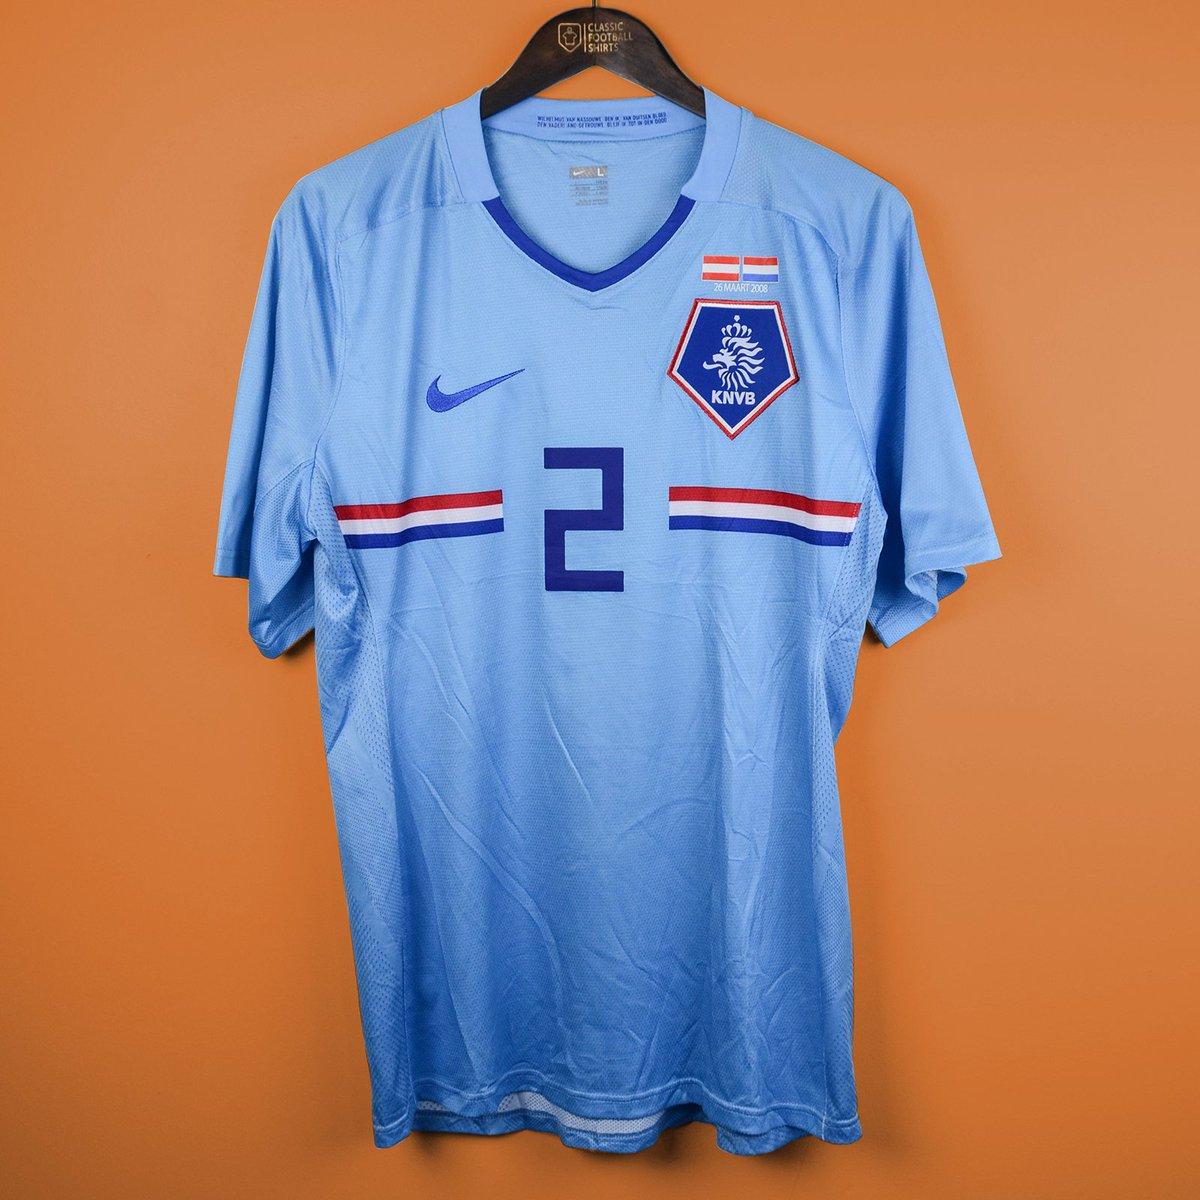 best service 55f92 287fa Classic Football Shirts on Twitter: